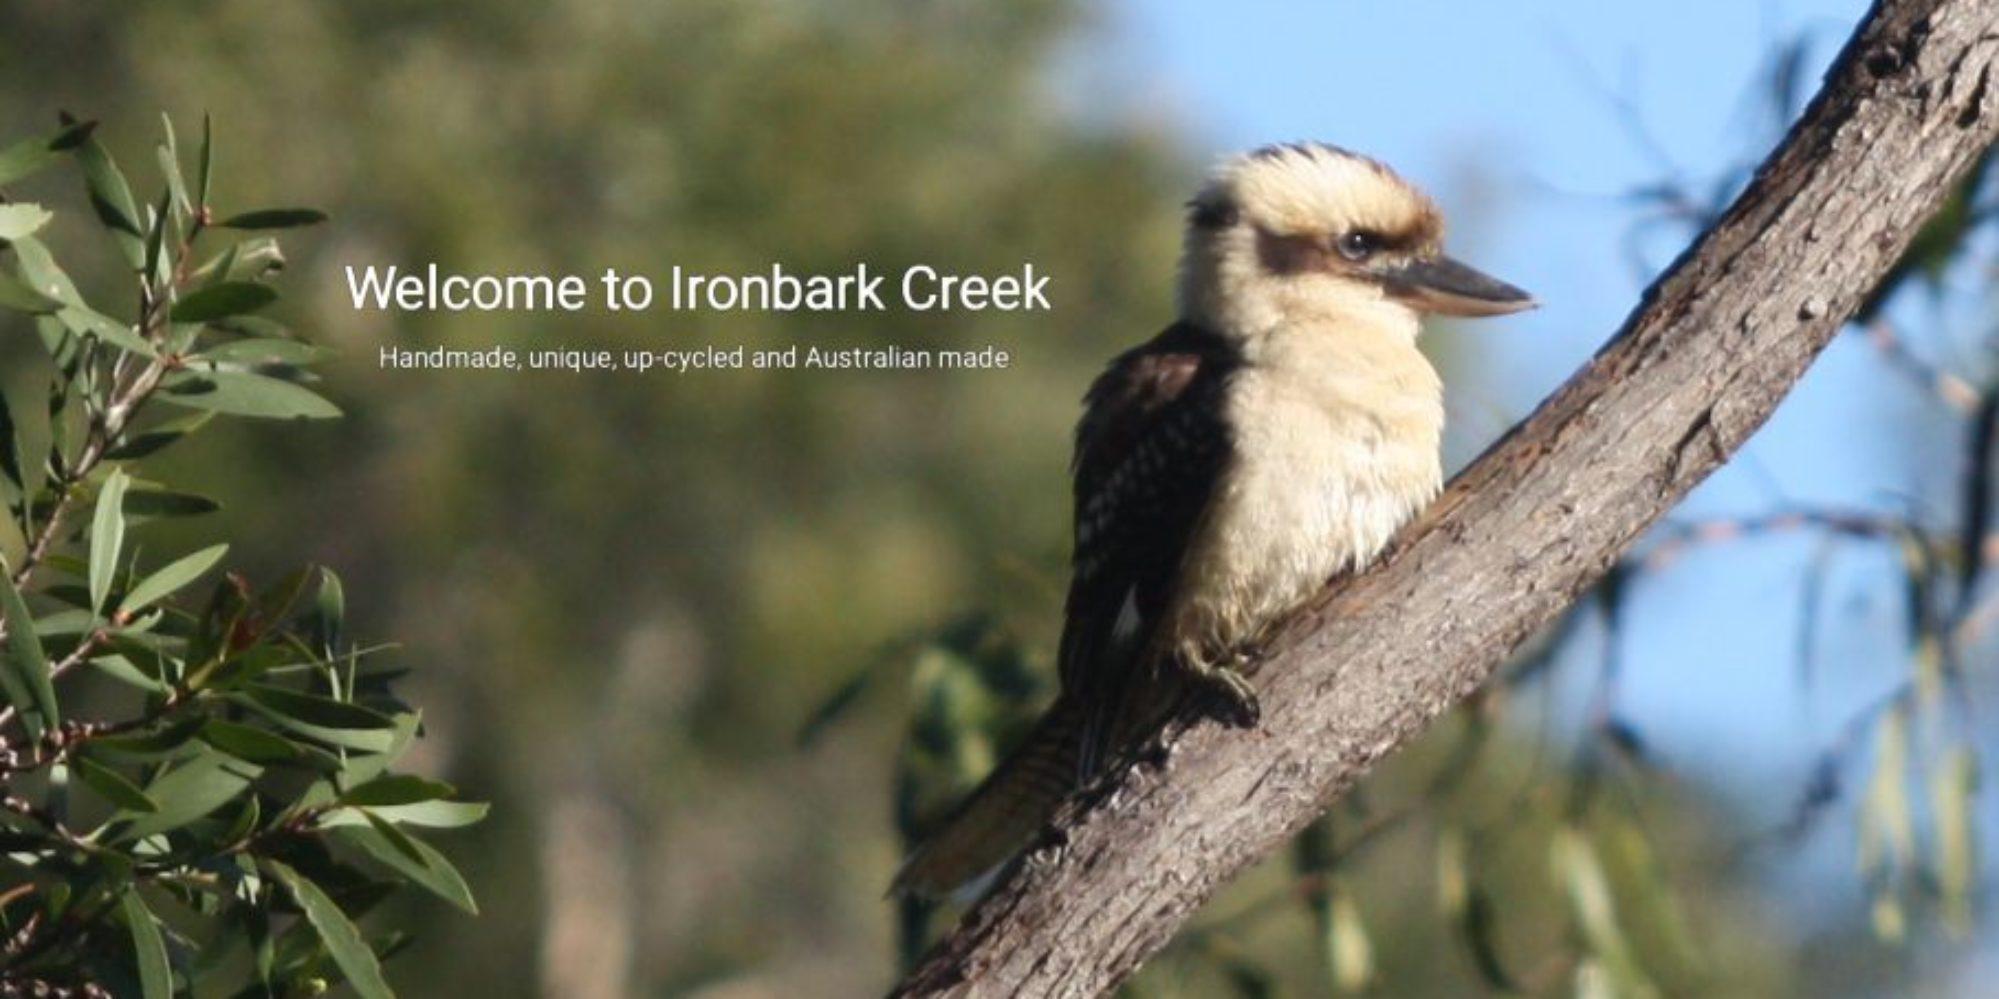 Ironbark Creek